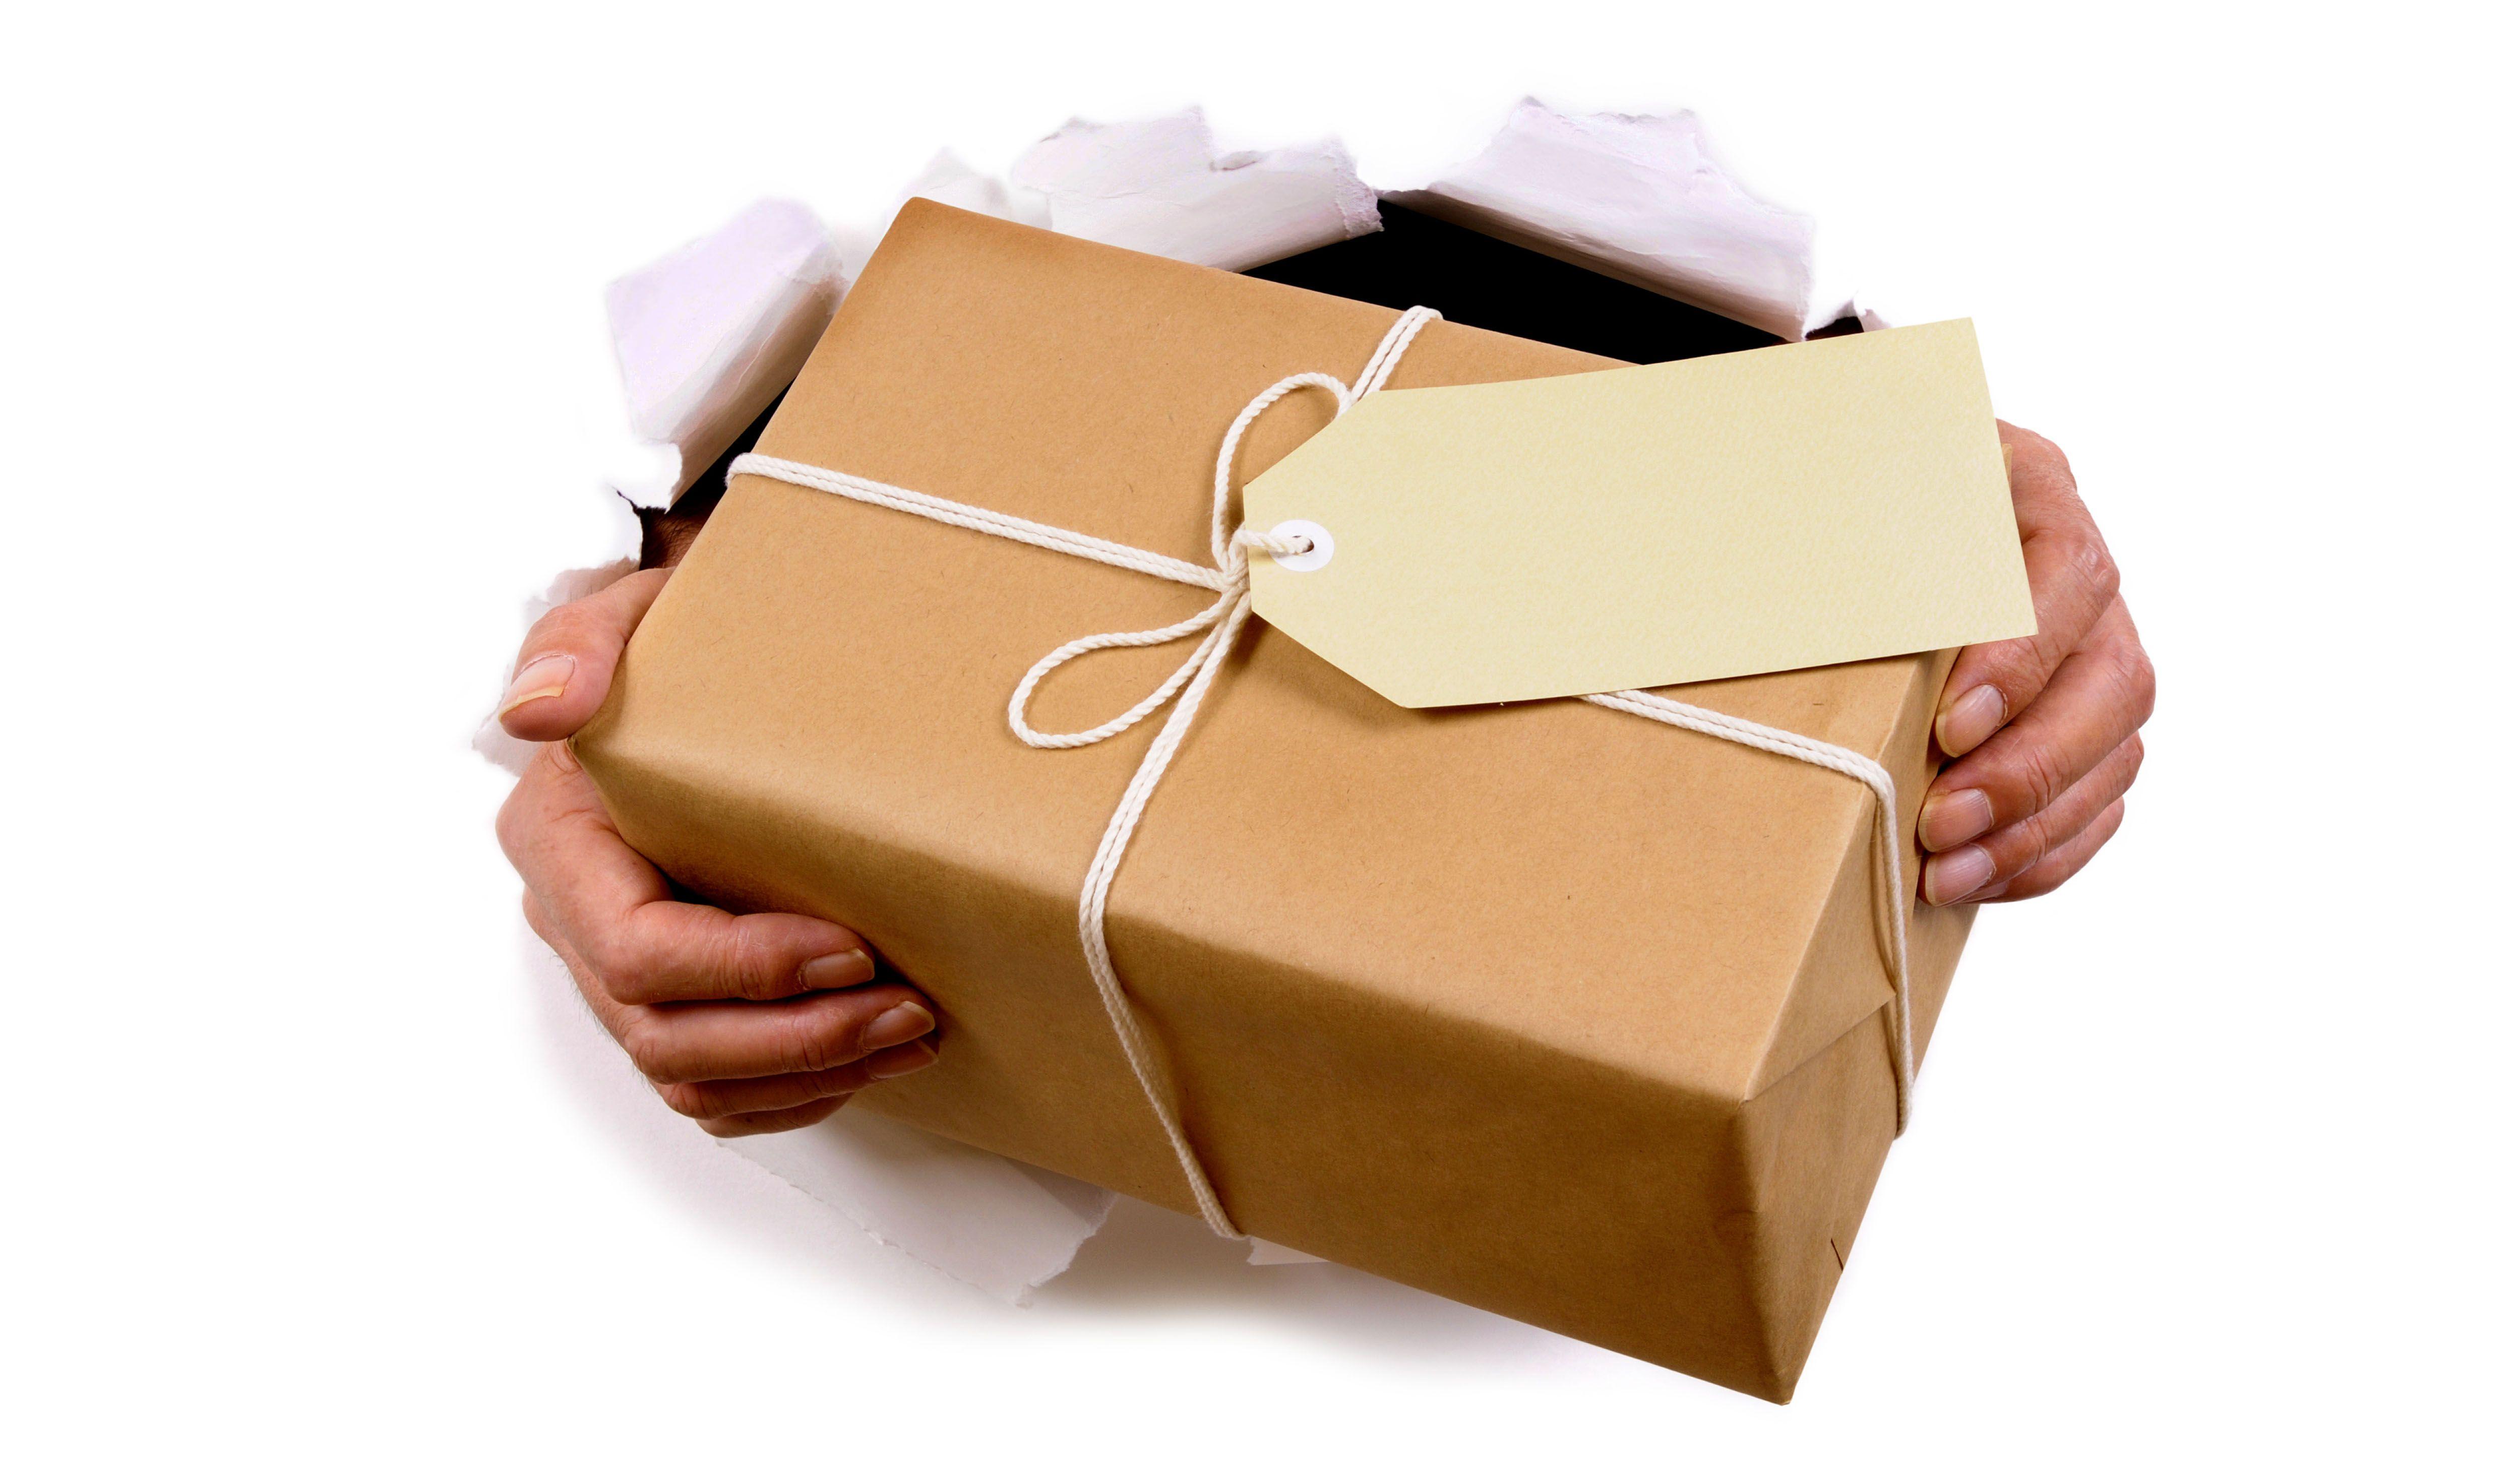 كيفية تسليم منتجاتك؟ Ebay store design, Courier service